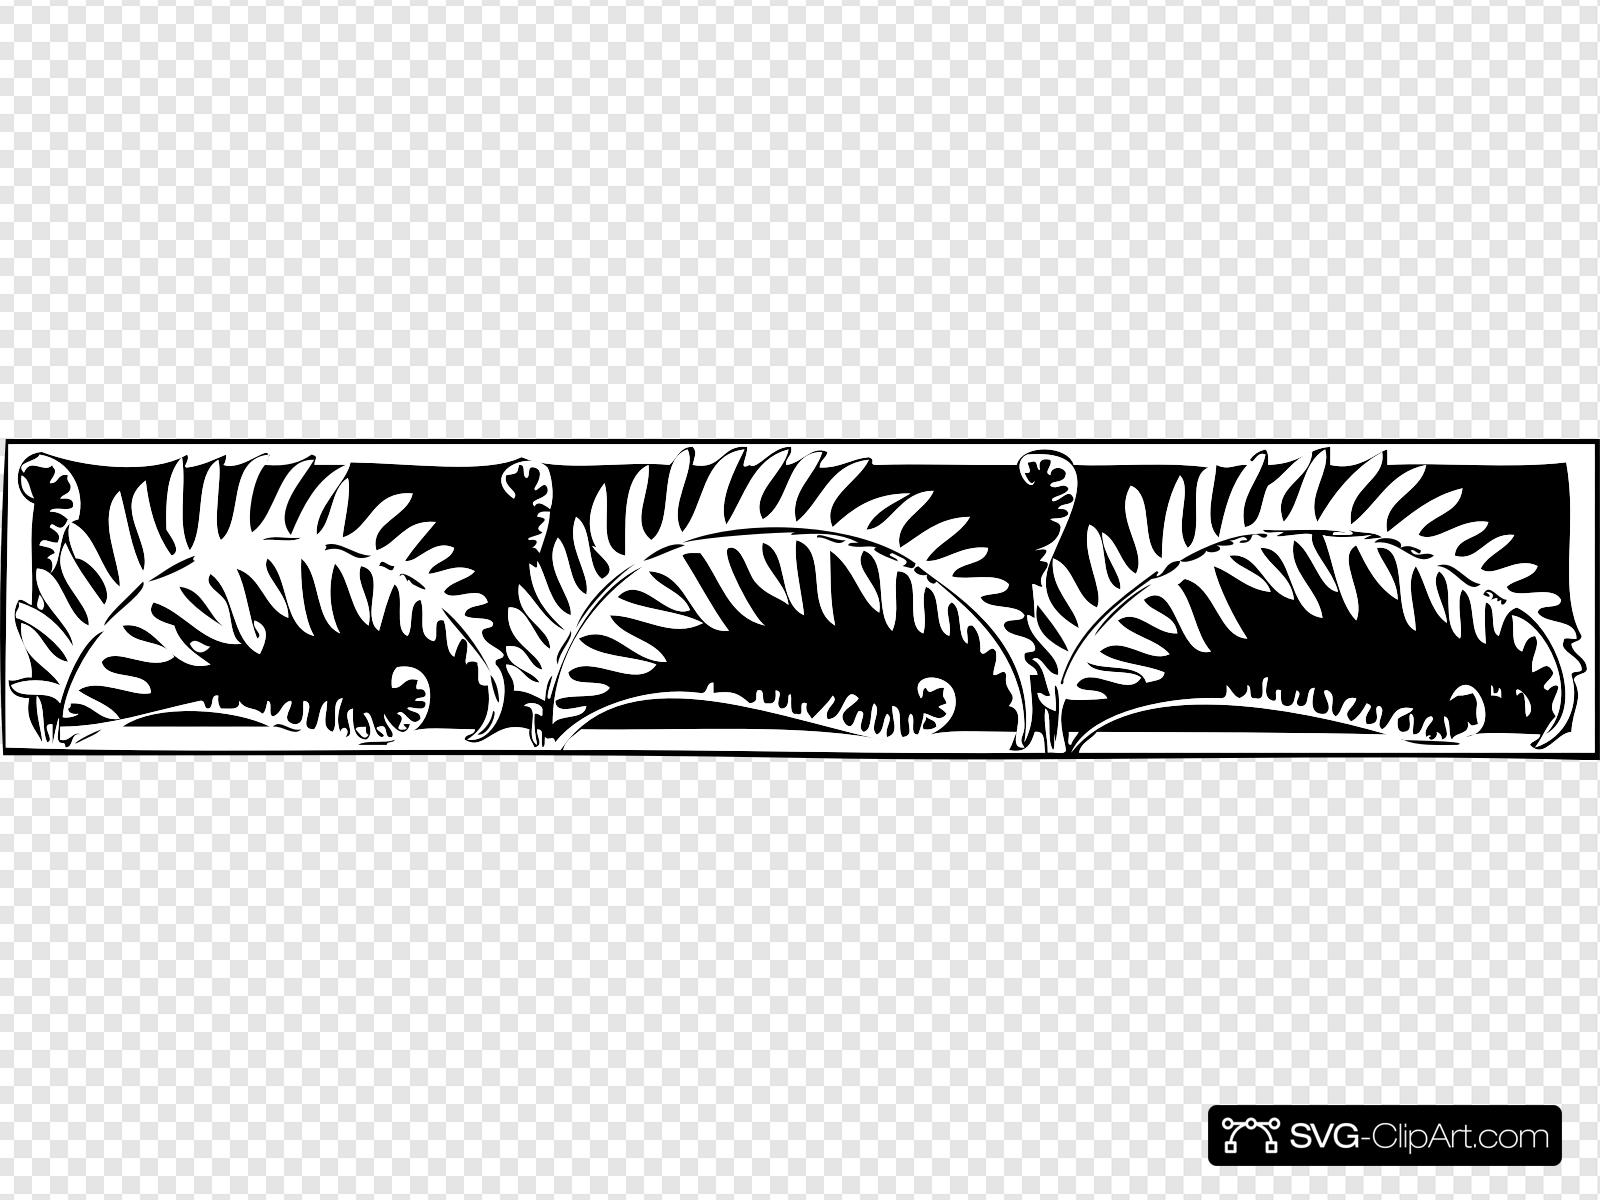 Fern Border Clip art, Icon and SVG.